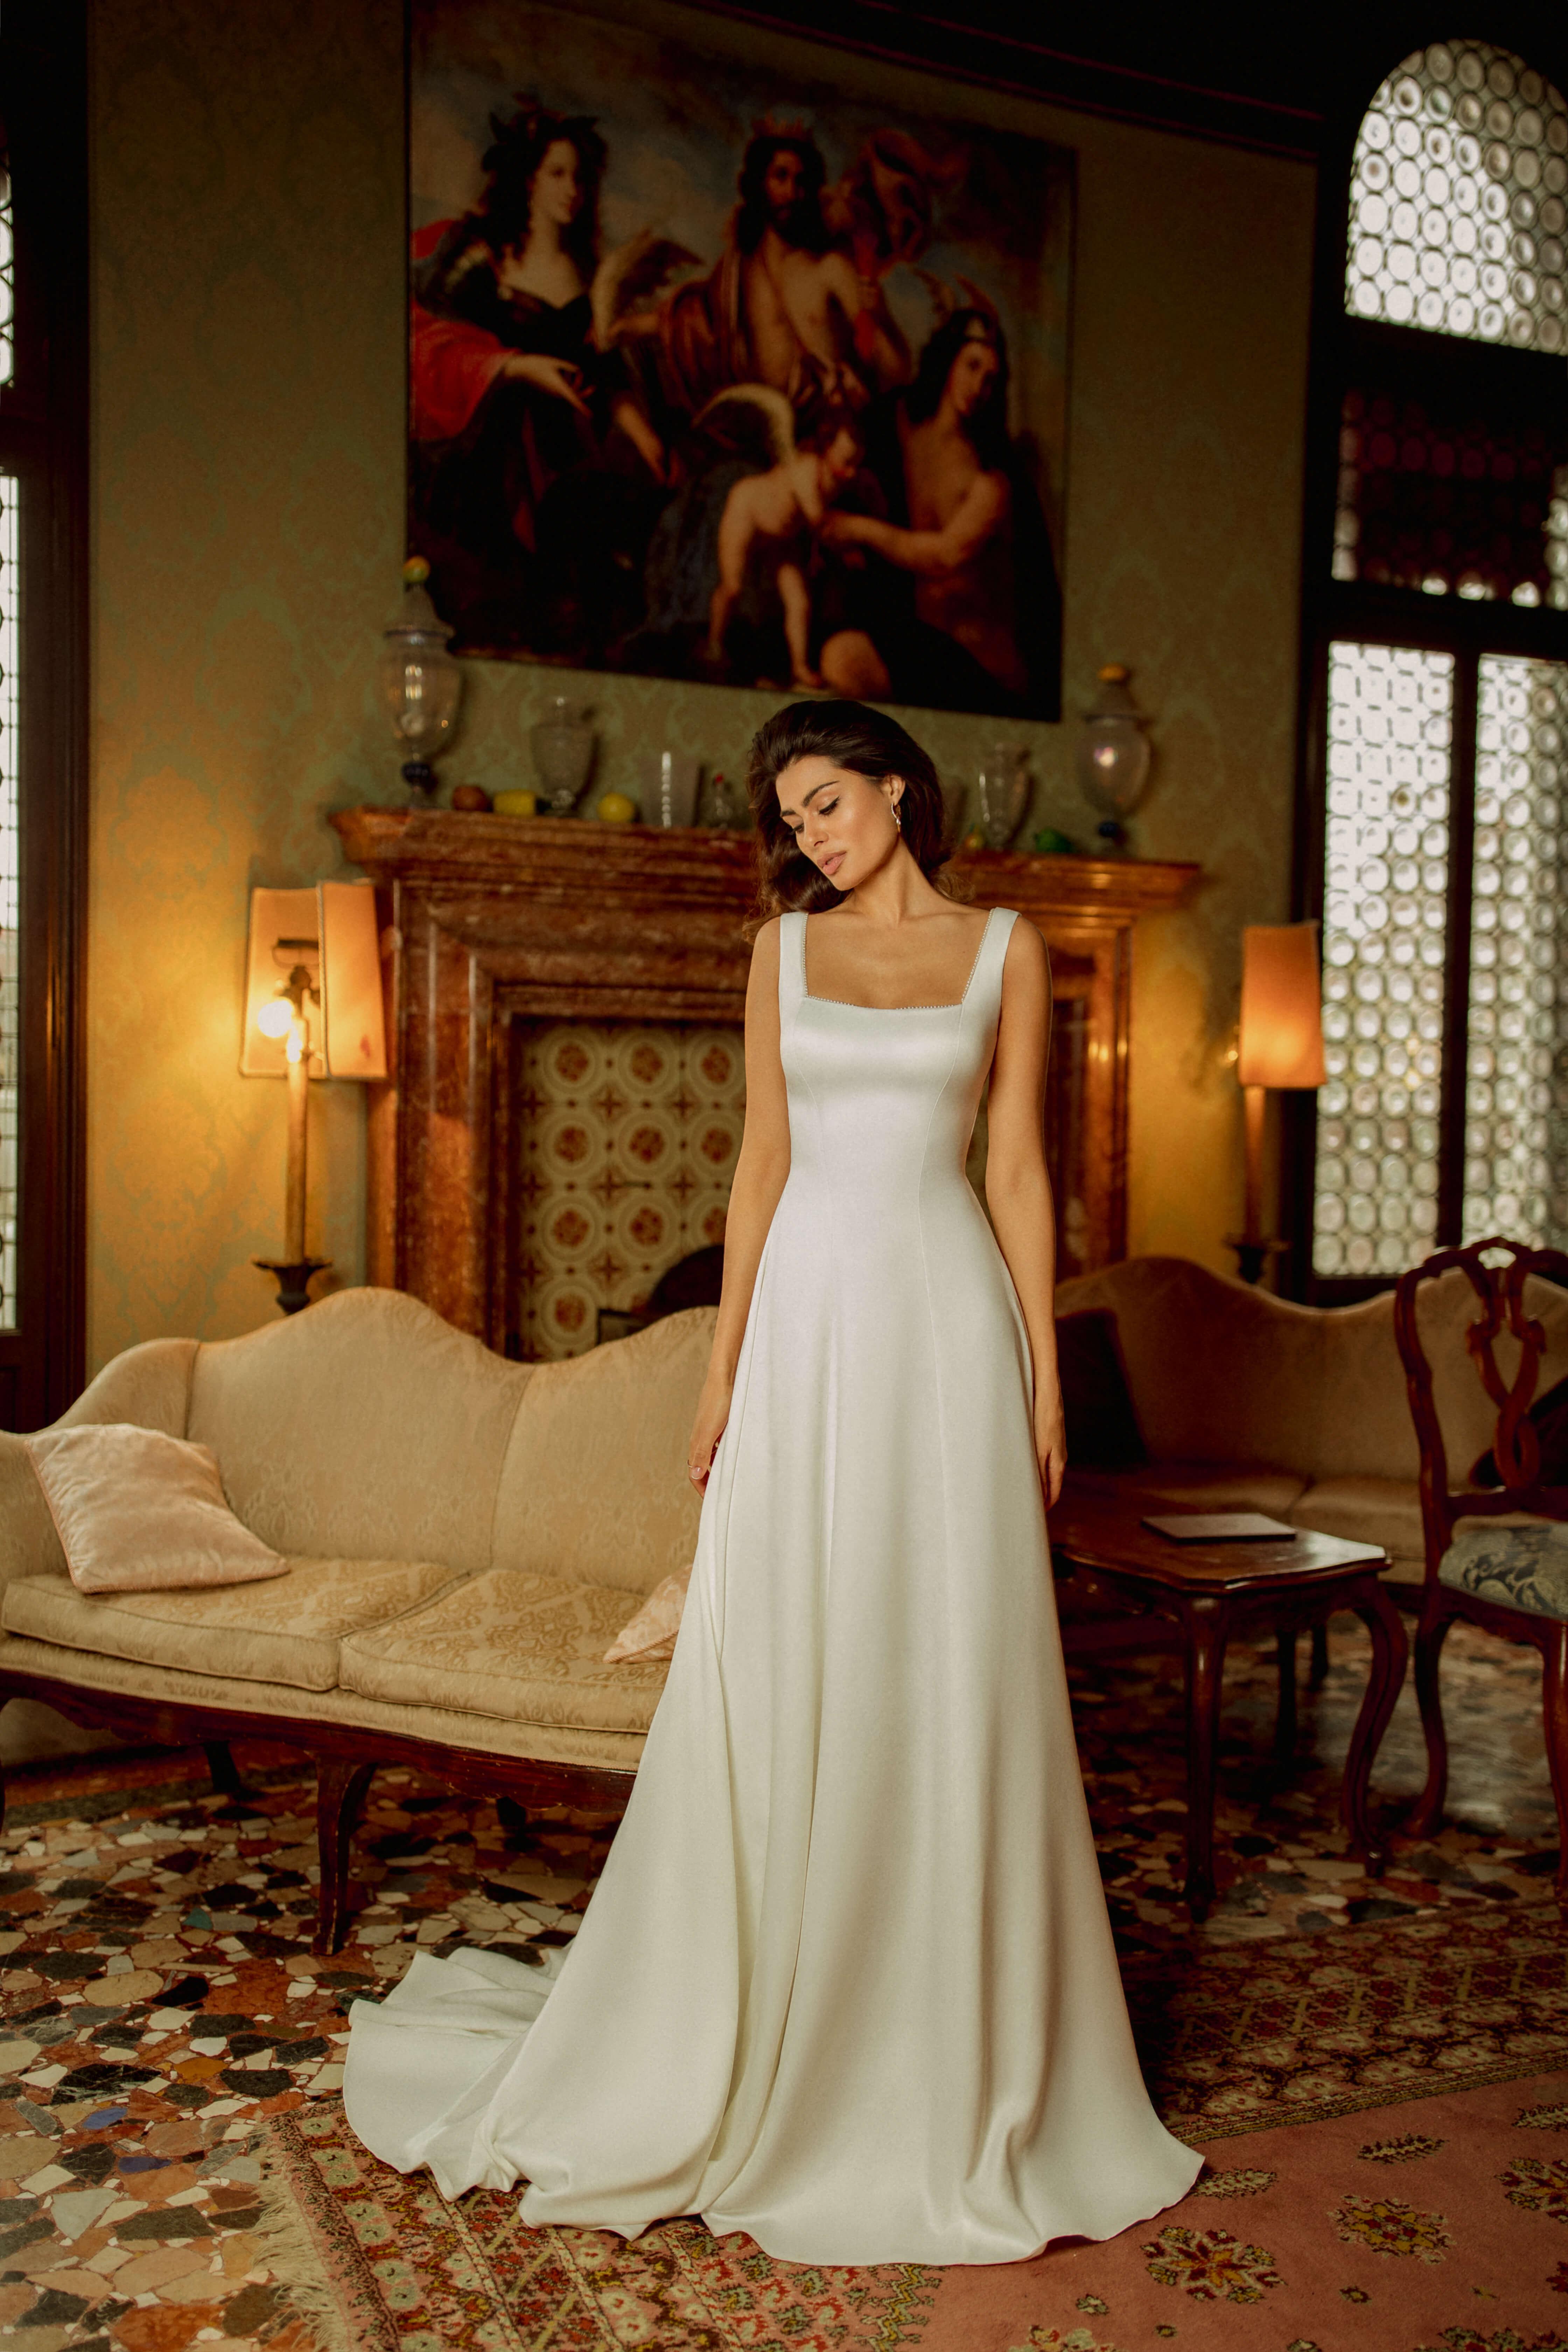 buy a wedding dress Kiev Rara Avis